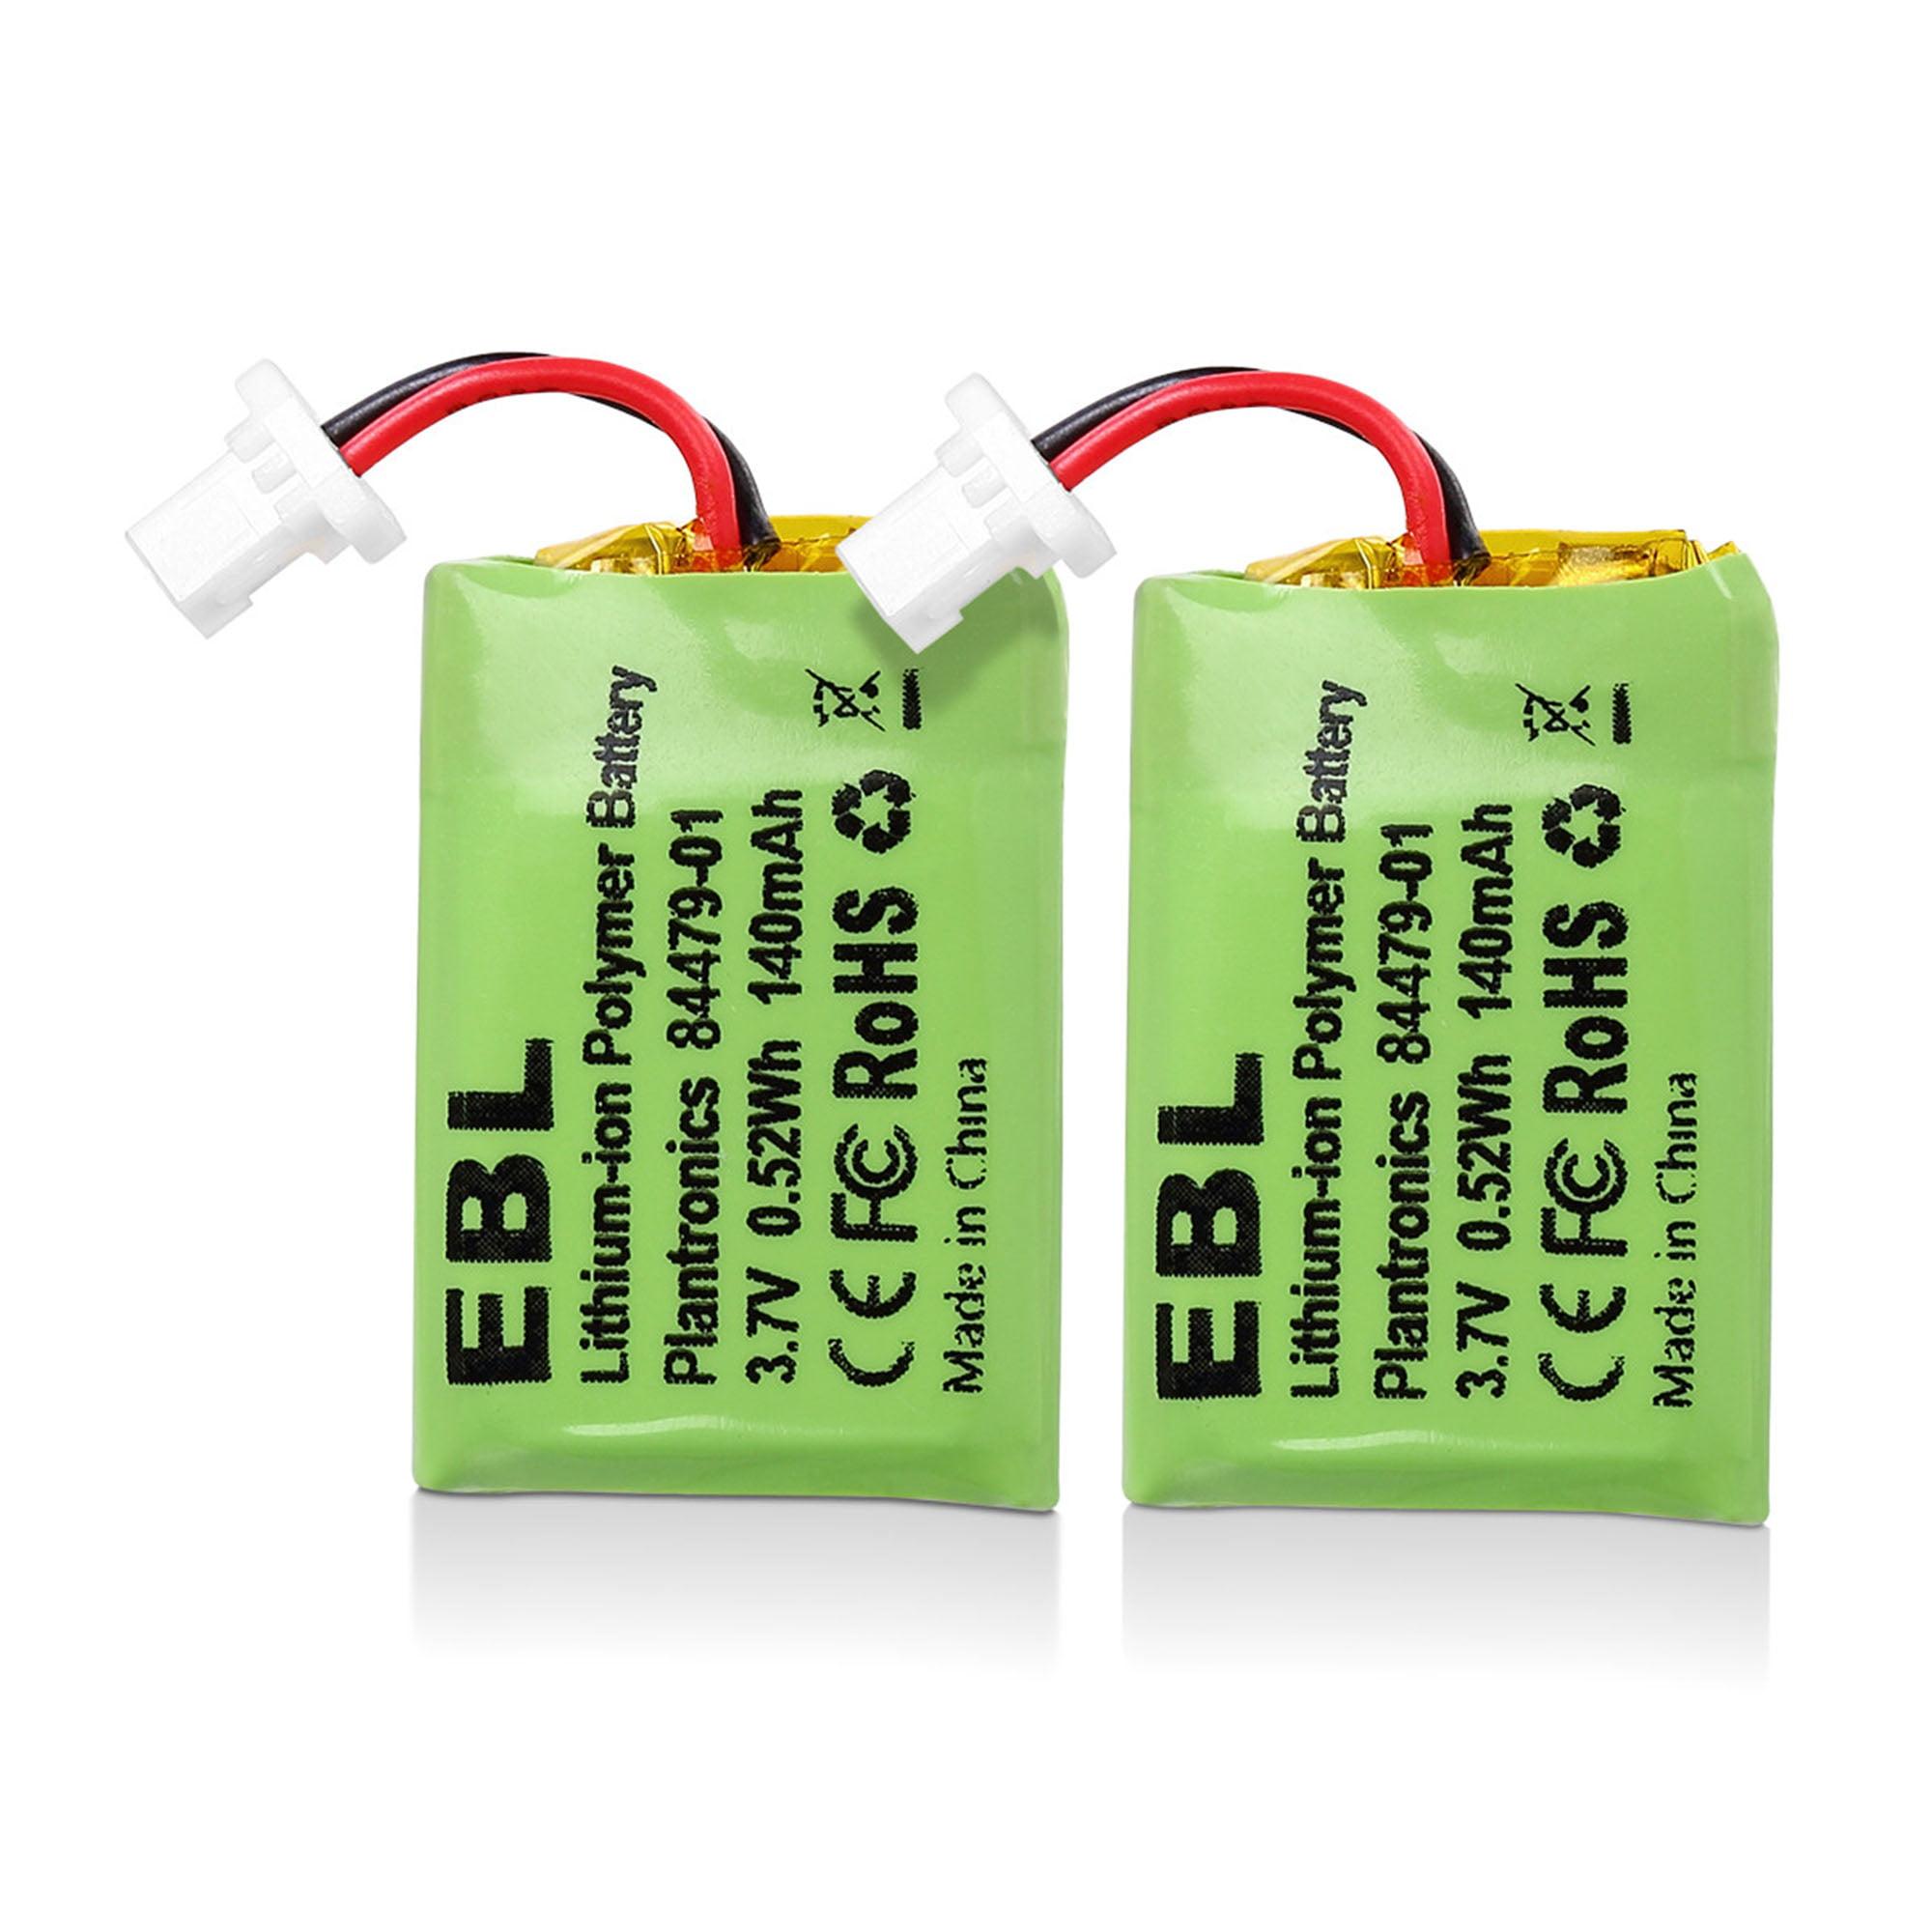 Ebl 2 Pack 140mah 3 7v Replacement Battery For Plantronics Cs540 86180 01 84479 01 Cs540a Cs540 C054 Wireless Headsets Walmart Com Walmart Com